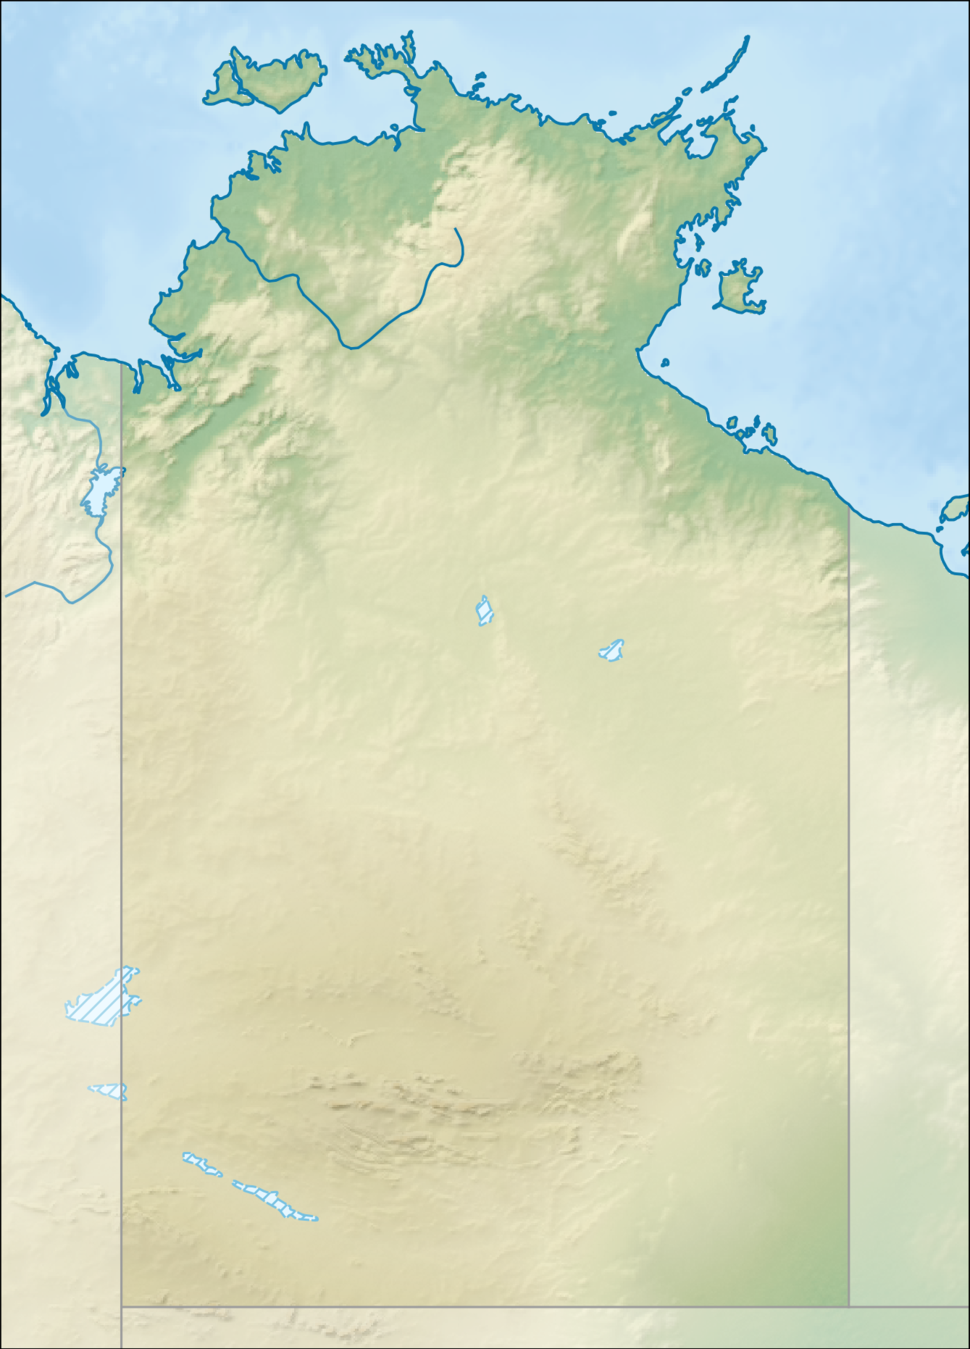 HMAS Coonawarra is located in Northern Territory